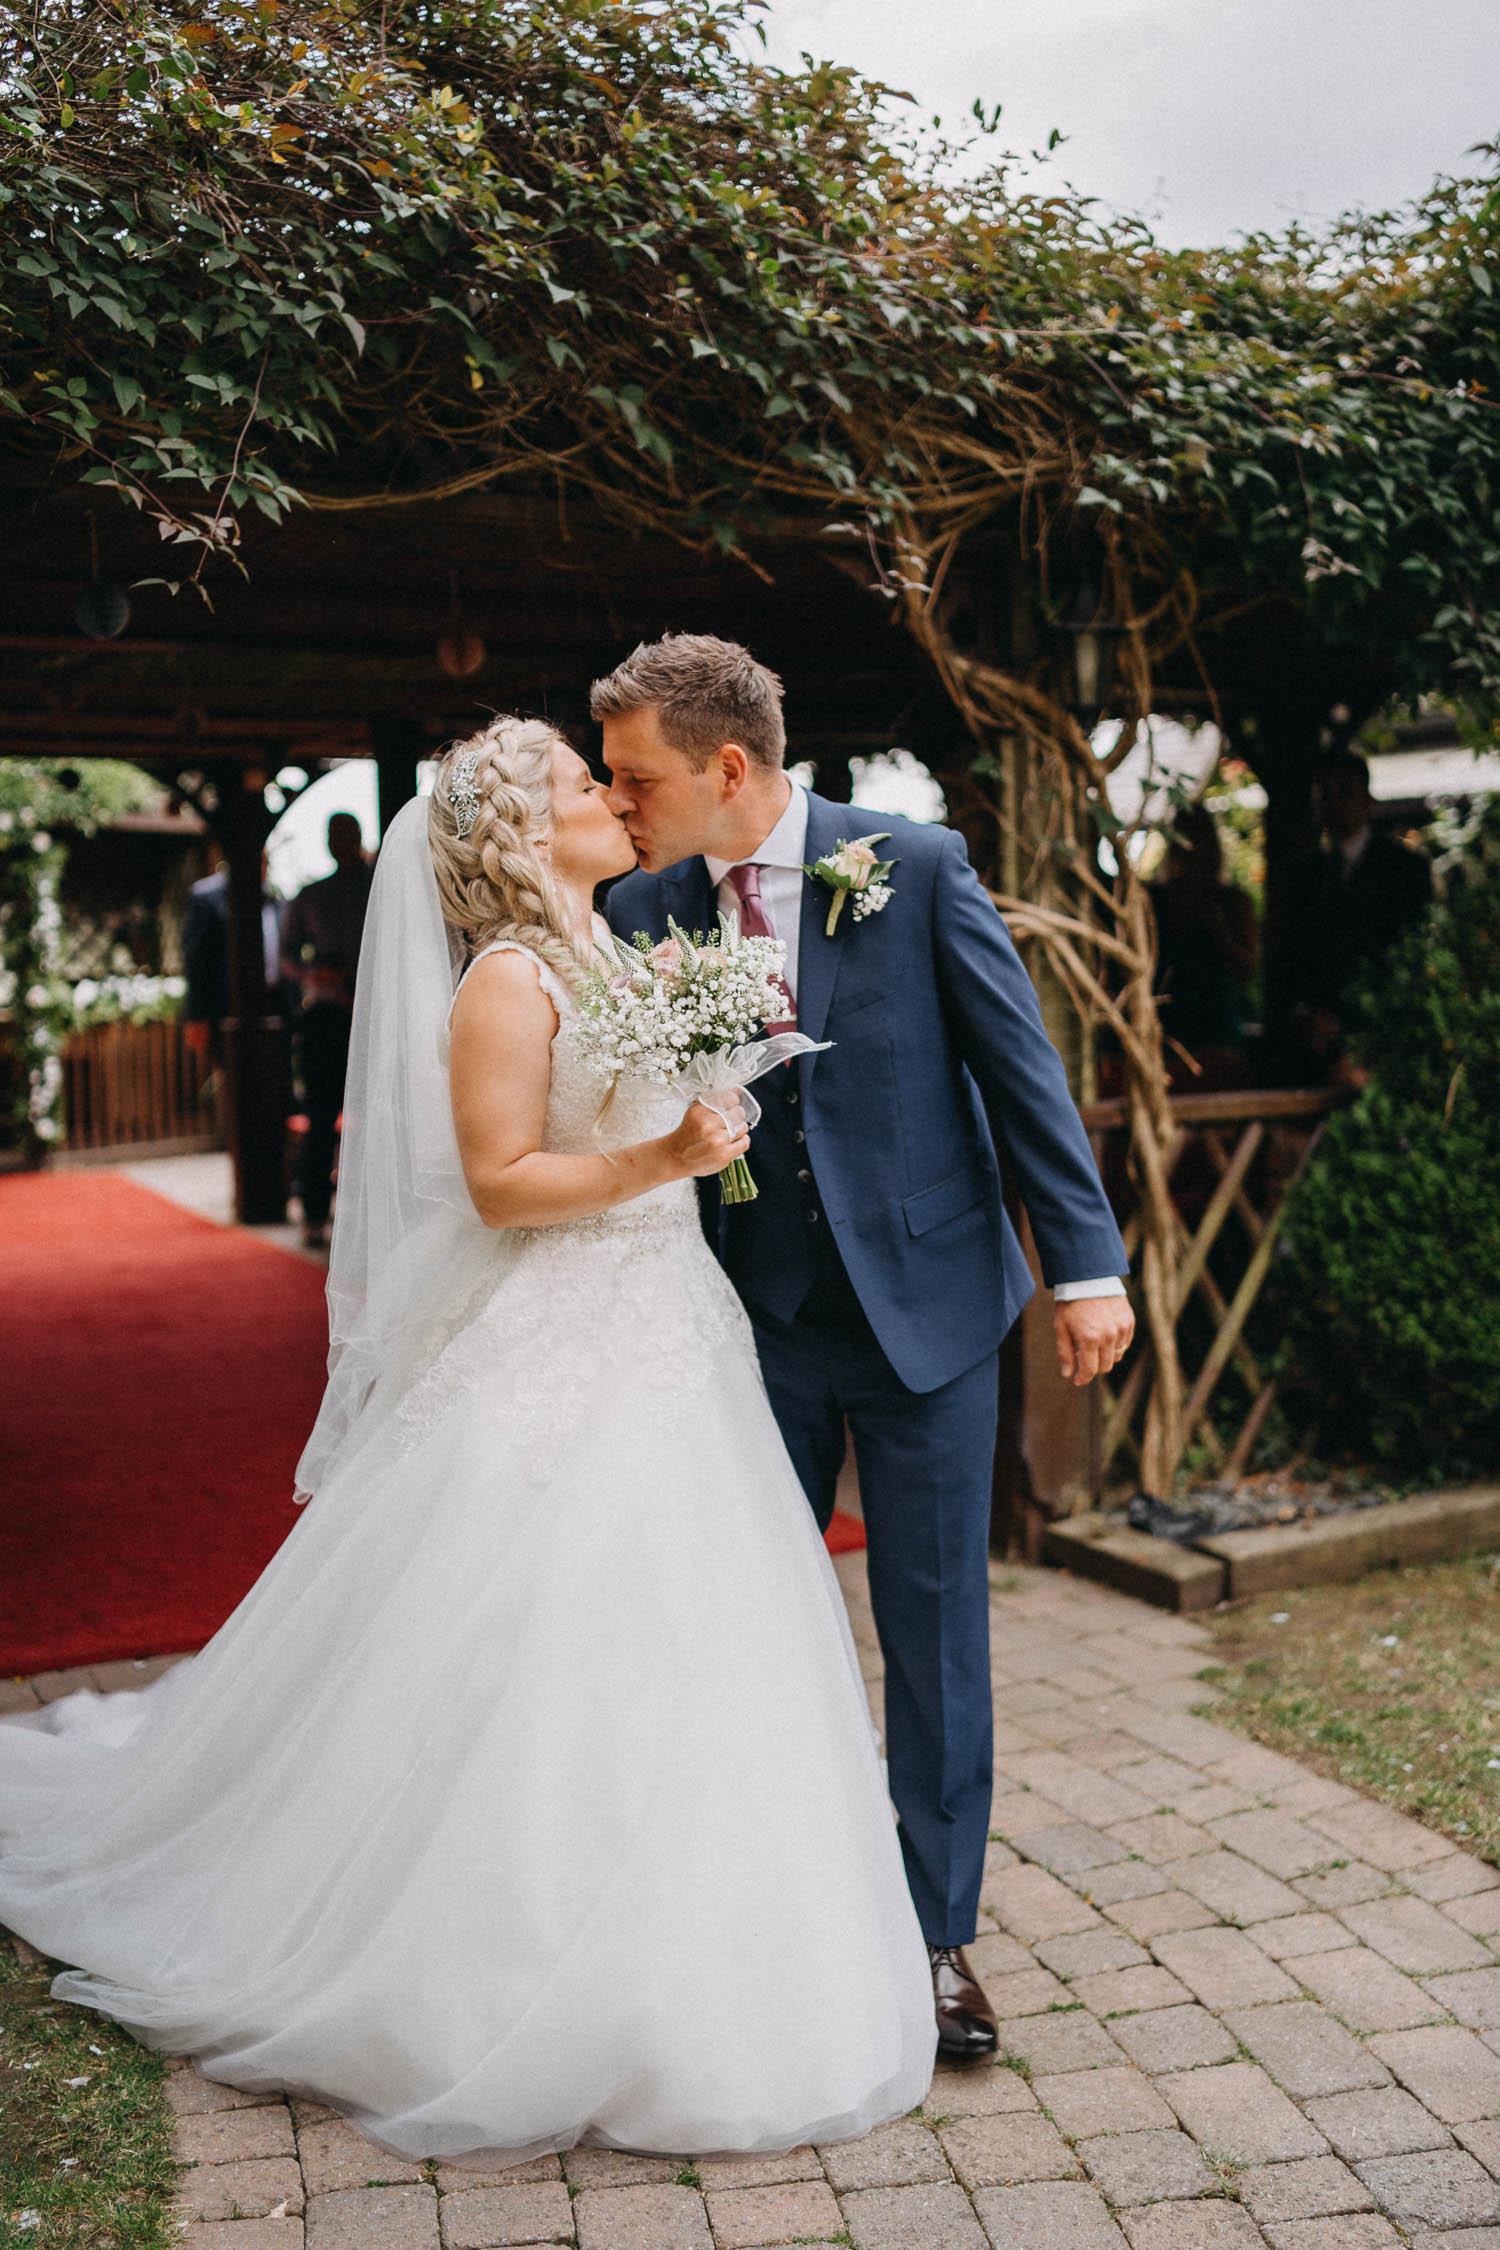 Wedding Photographer in Kent, UK